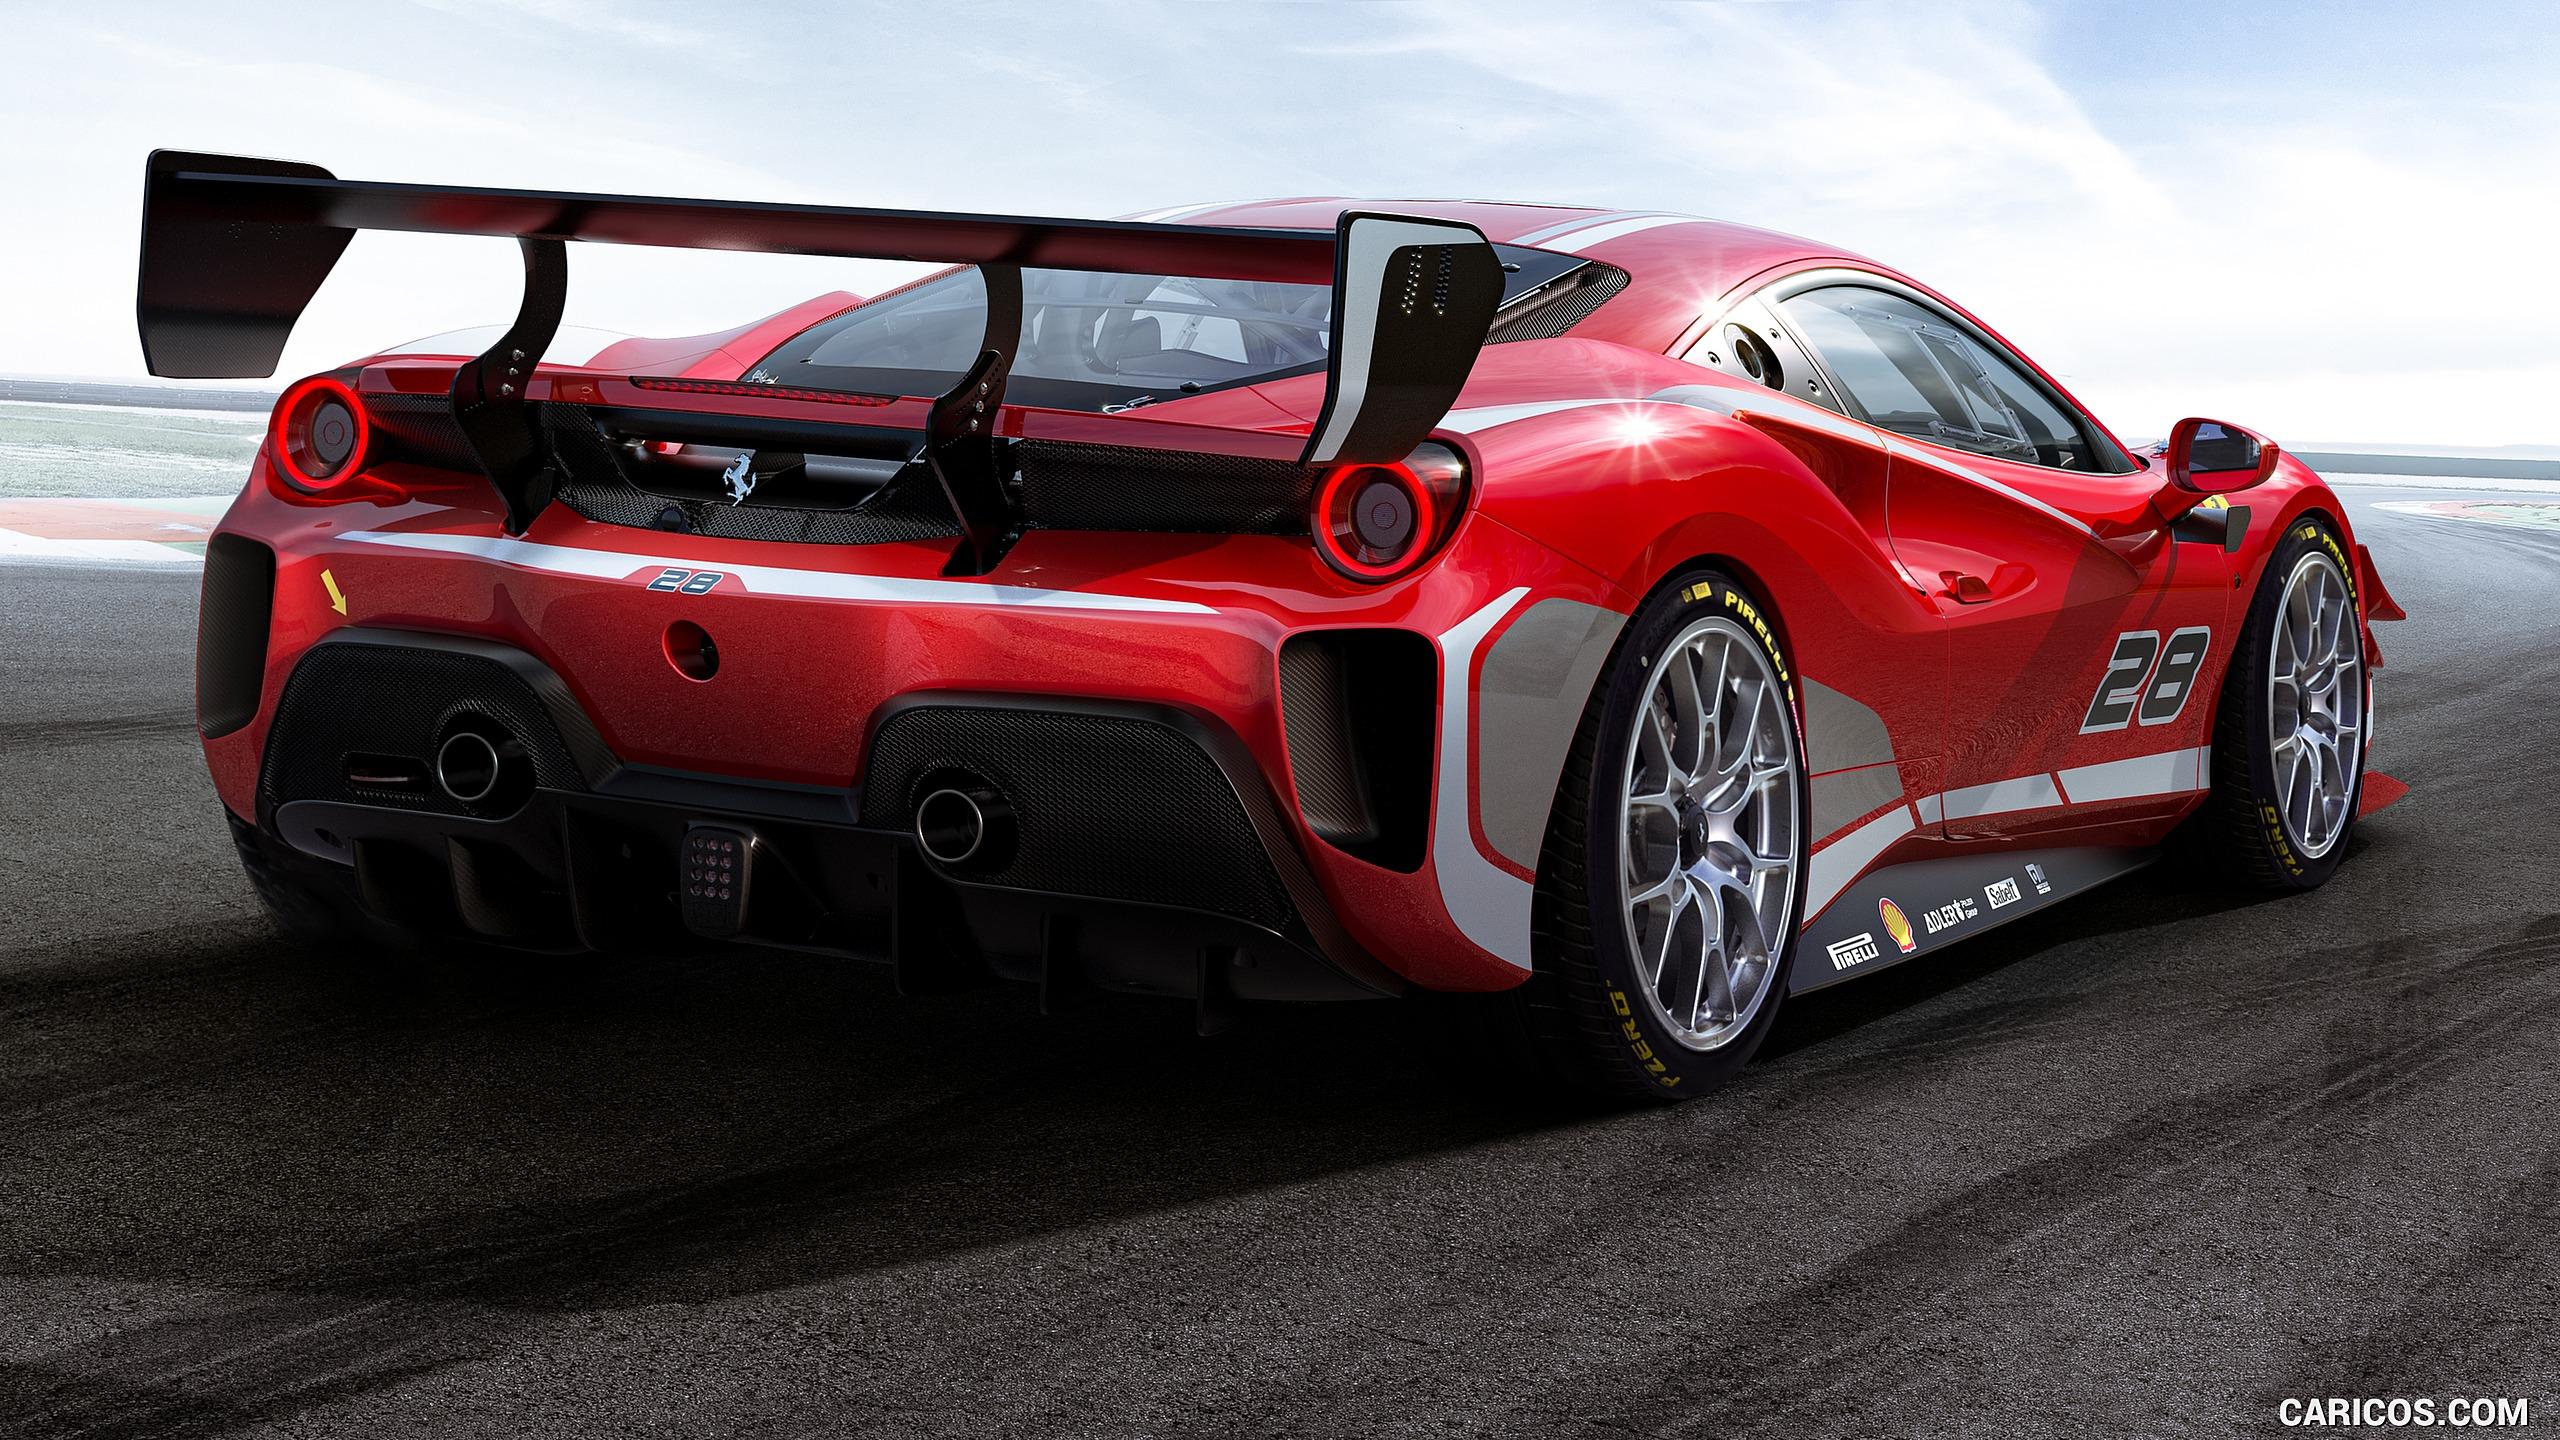 2020 Ferrari 488 Challenge Evo   Rear Three Quarter HD Wallpaper 2 2560x1440